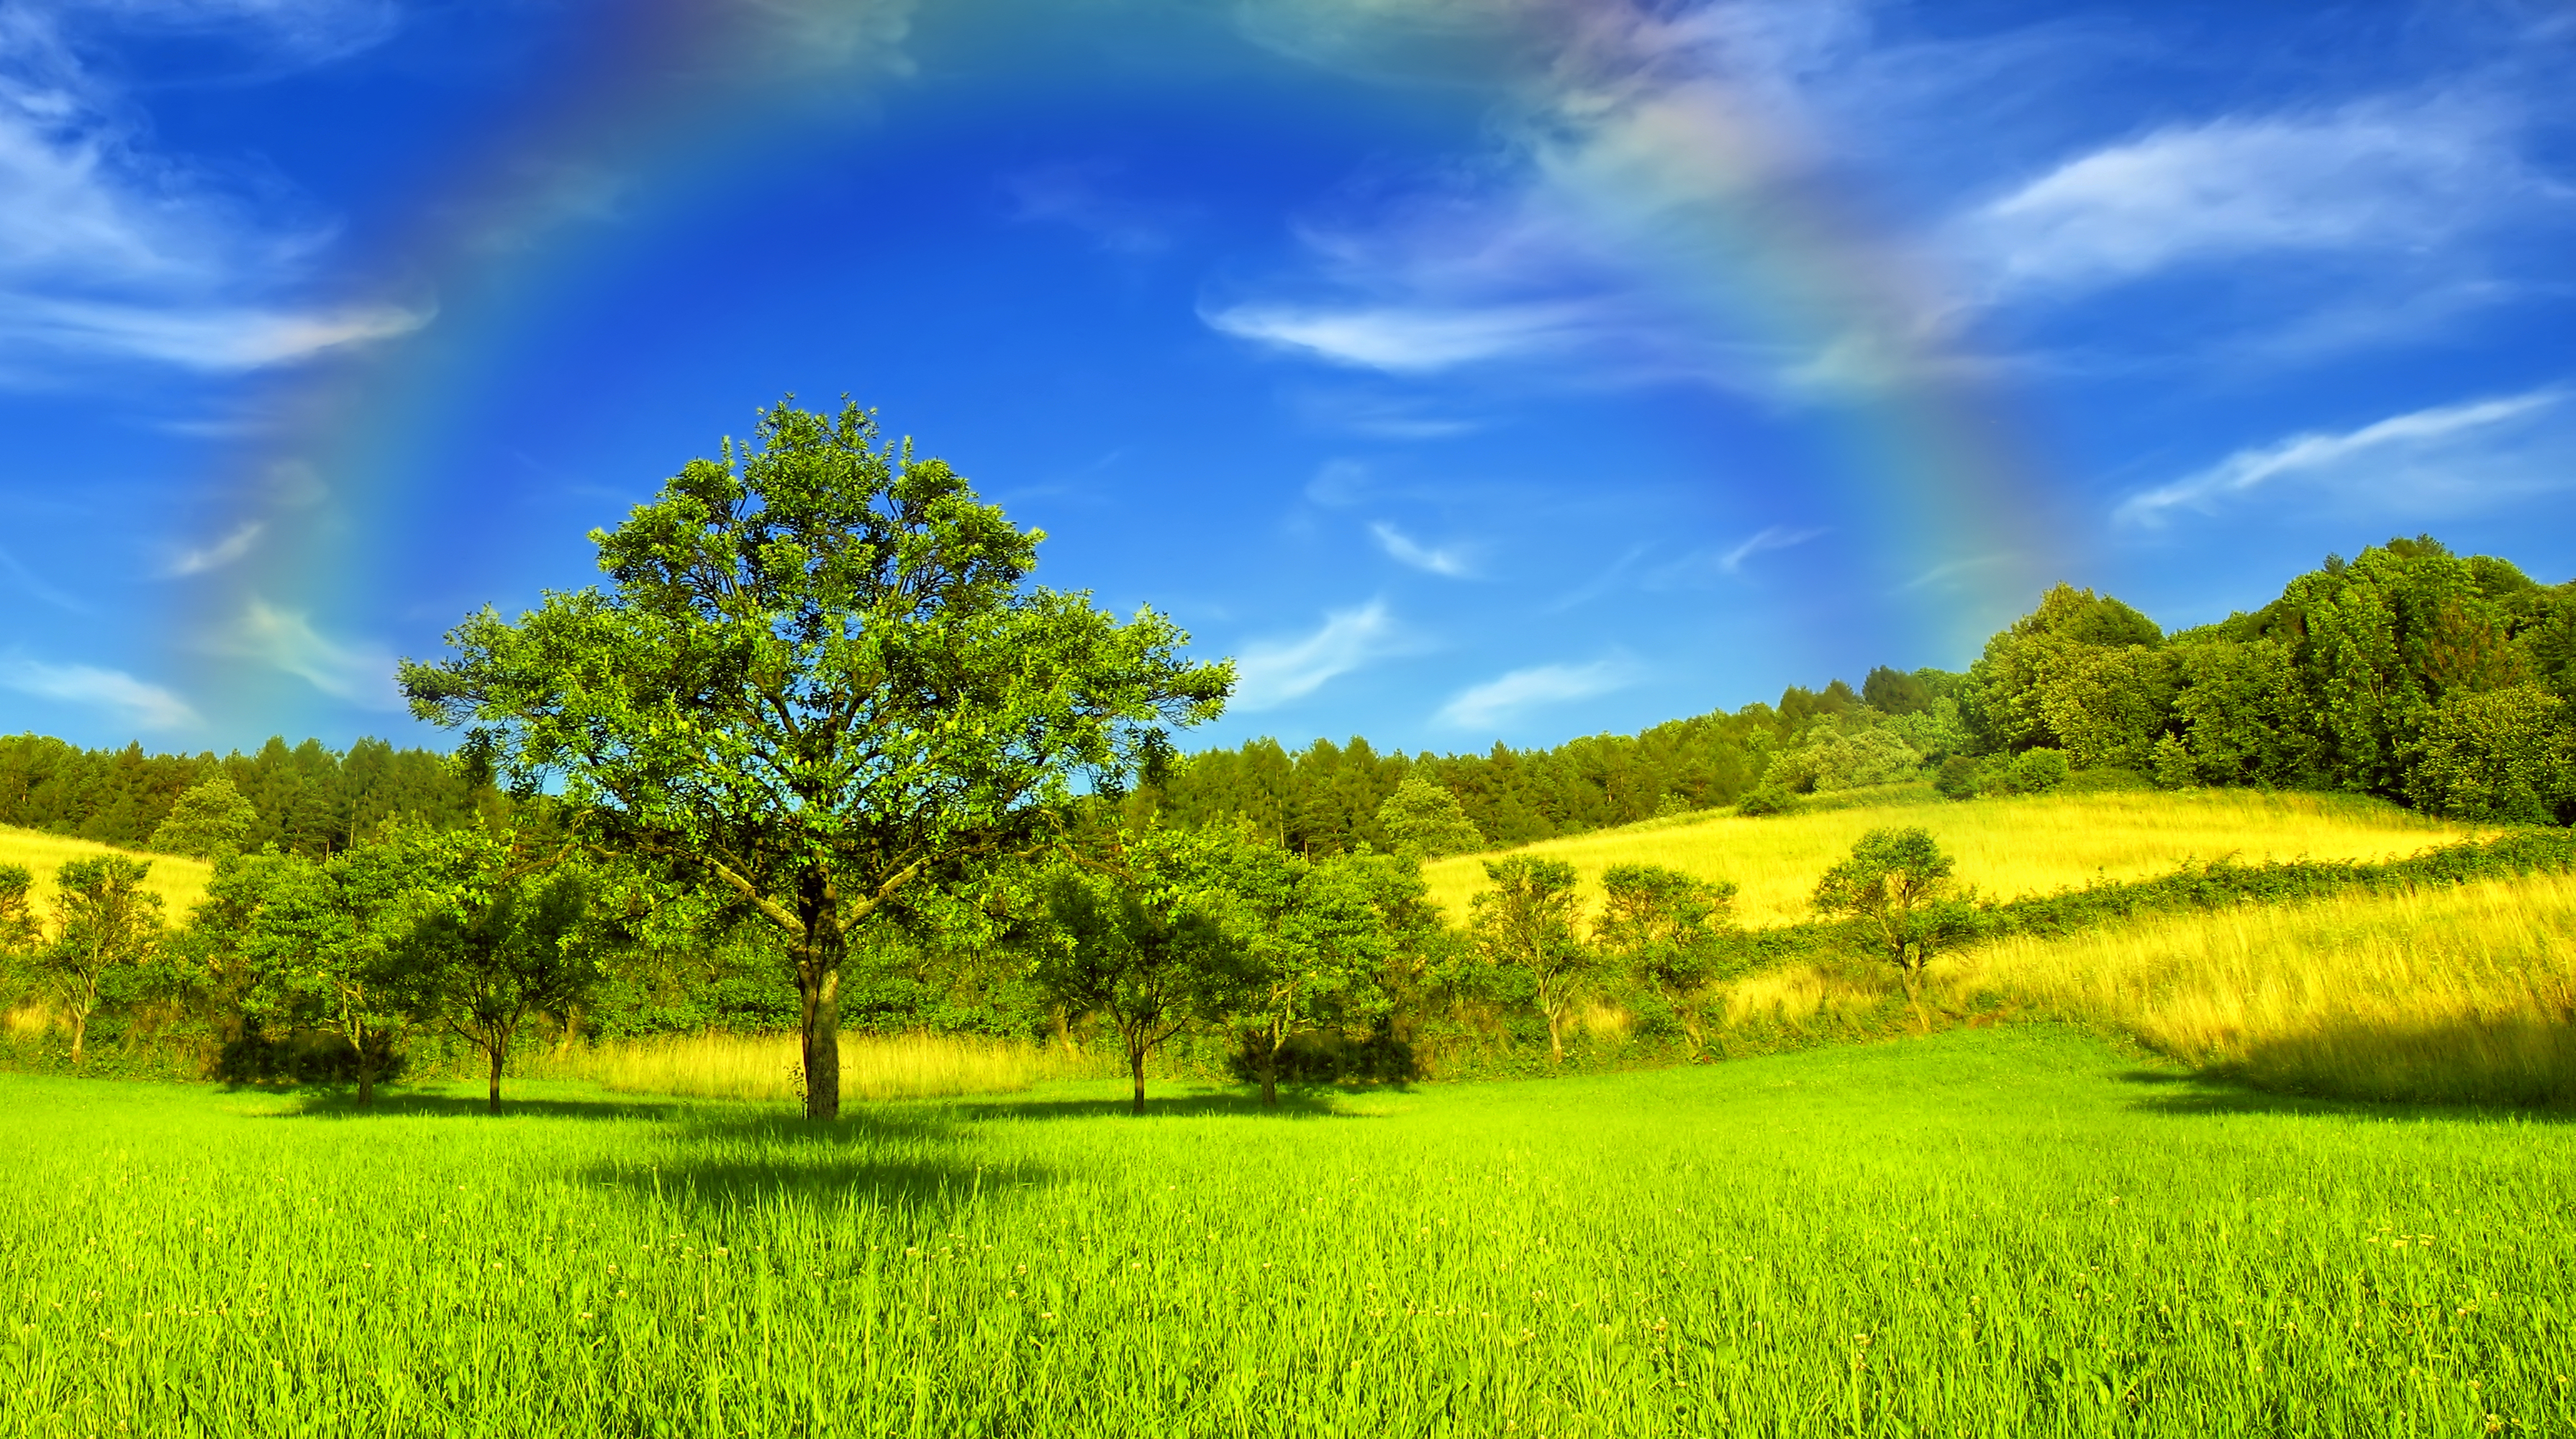 Image Summer Nature Rainbow Sky Grass Trees 3580x2000